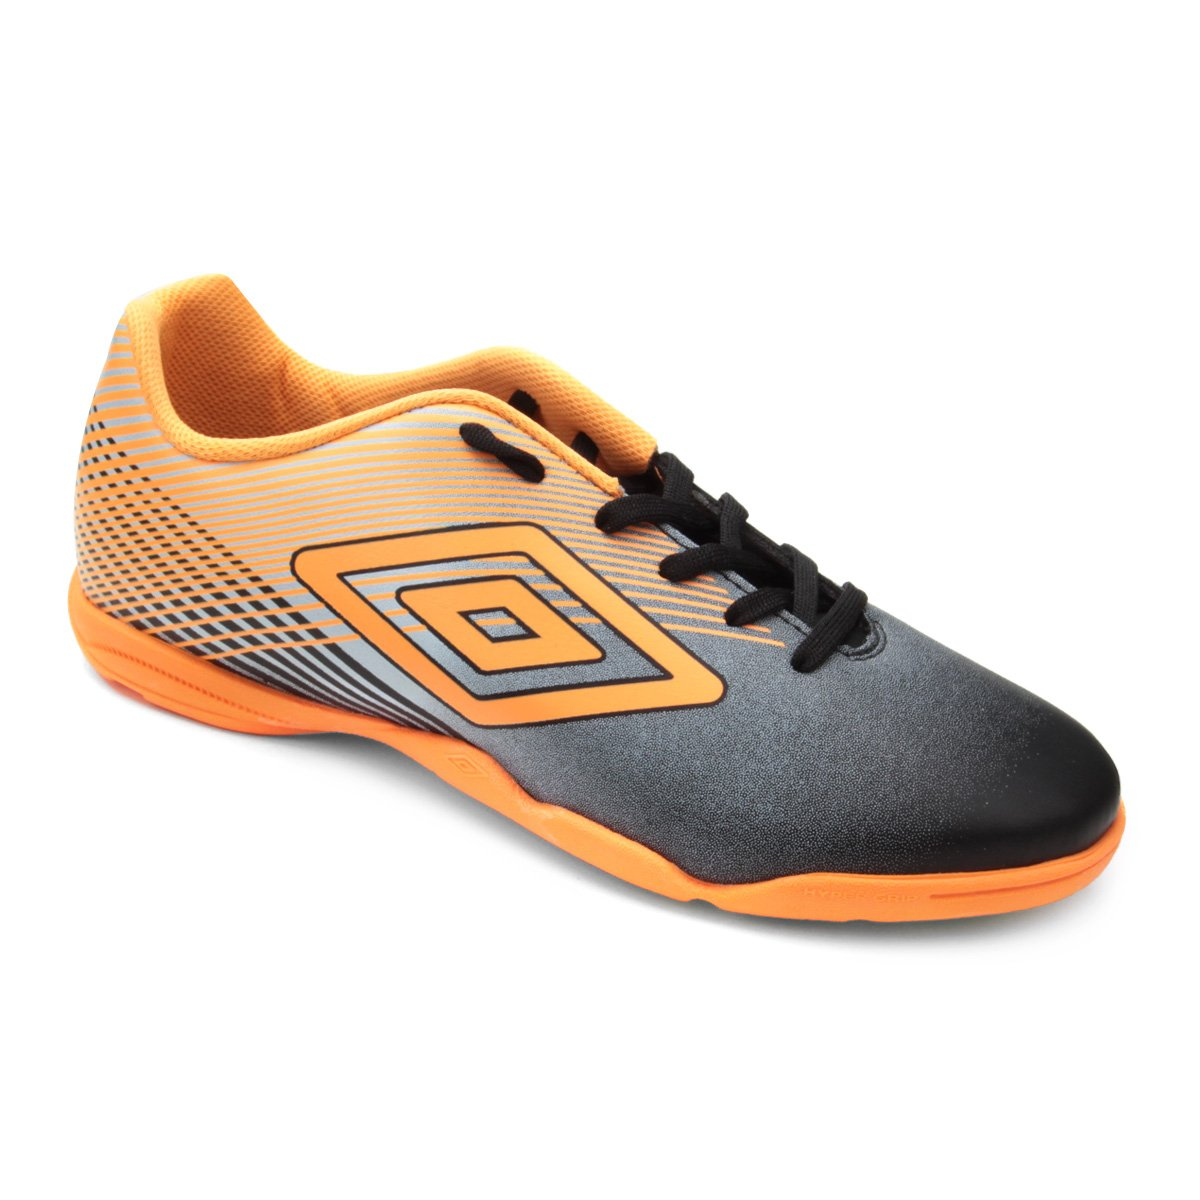 cd6337c83f56f Chuteira Futsal Umbro Slice III - Compre Agora